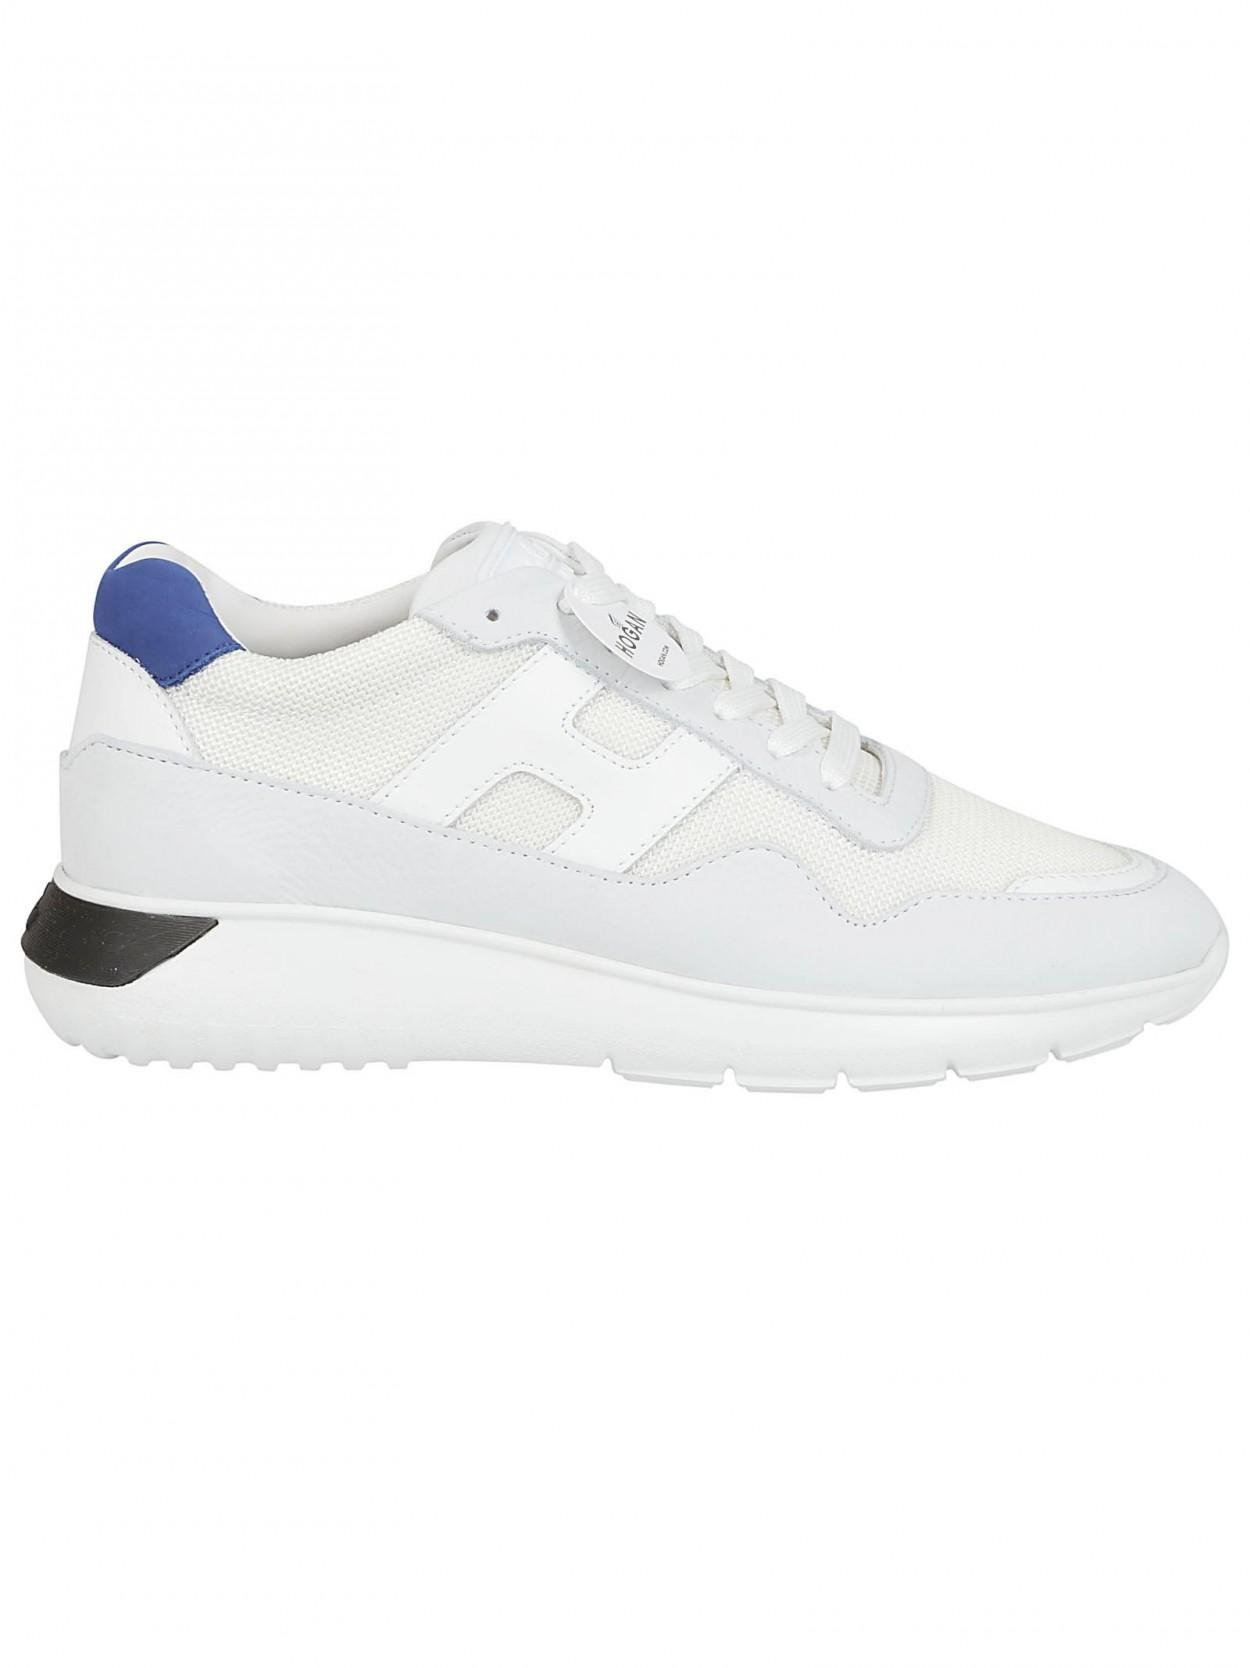 4df6ac8f5373 Lyst - Hogan HOGAN sneaker bianca interactive 3 in White for Men